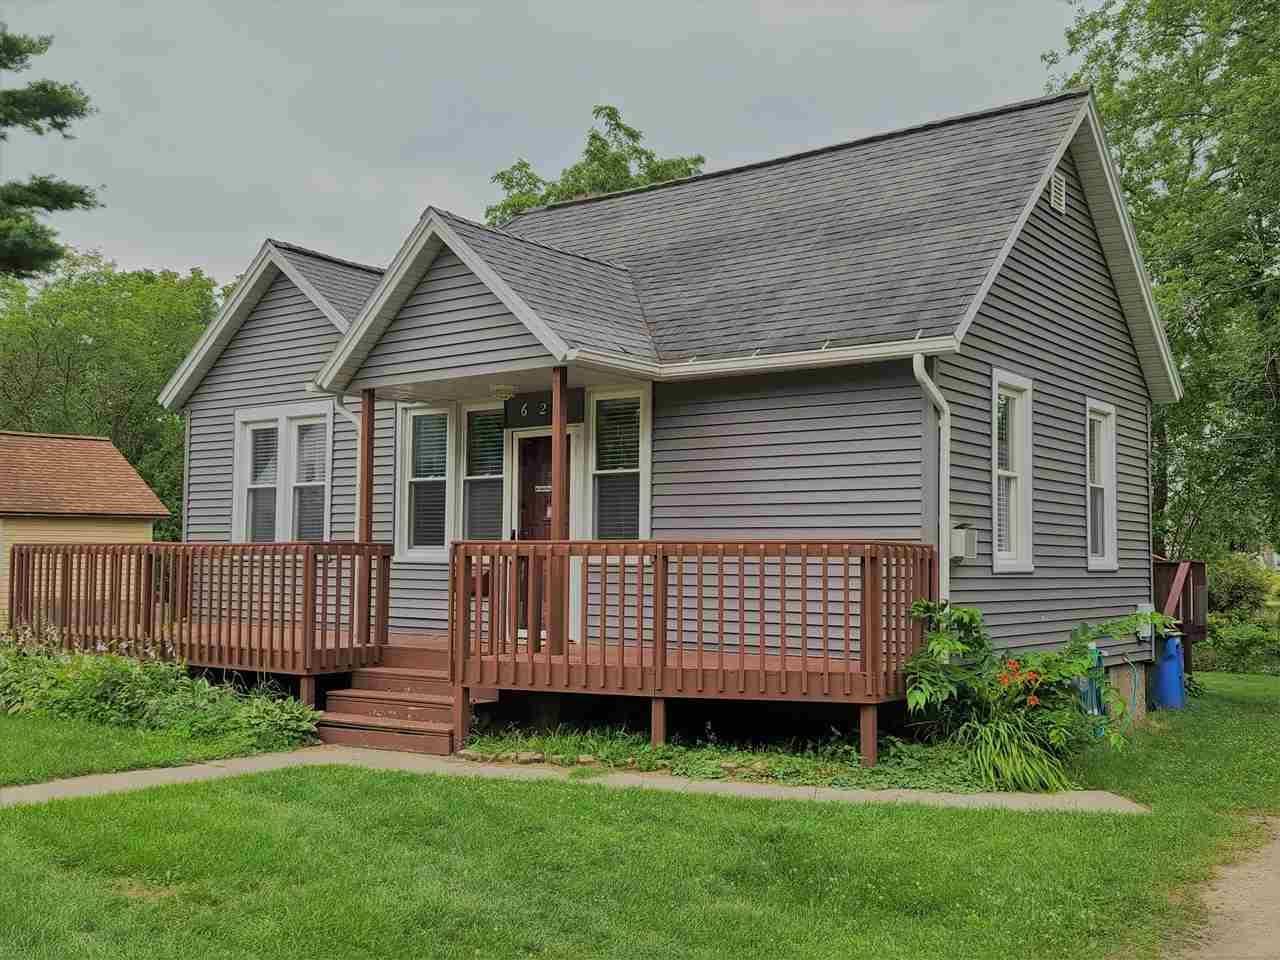 628 E Edgewater St, Portage, WI 53901 - #: 1914439